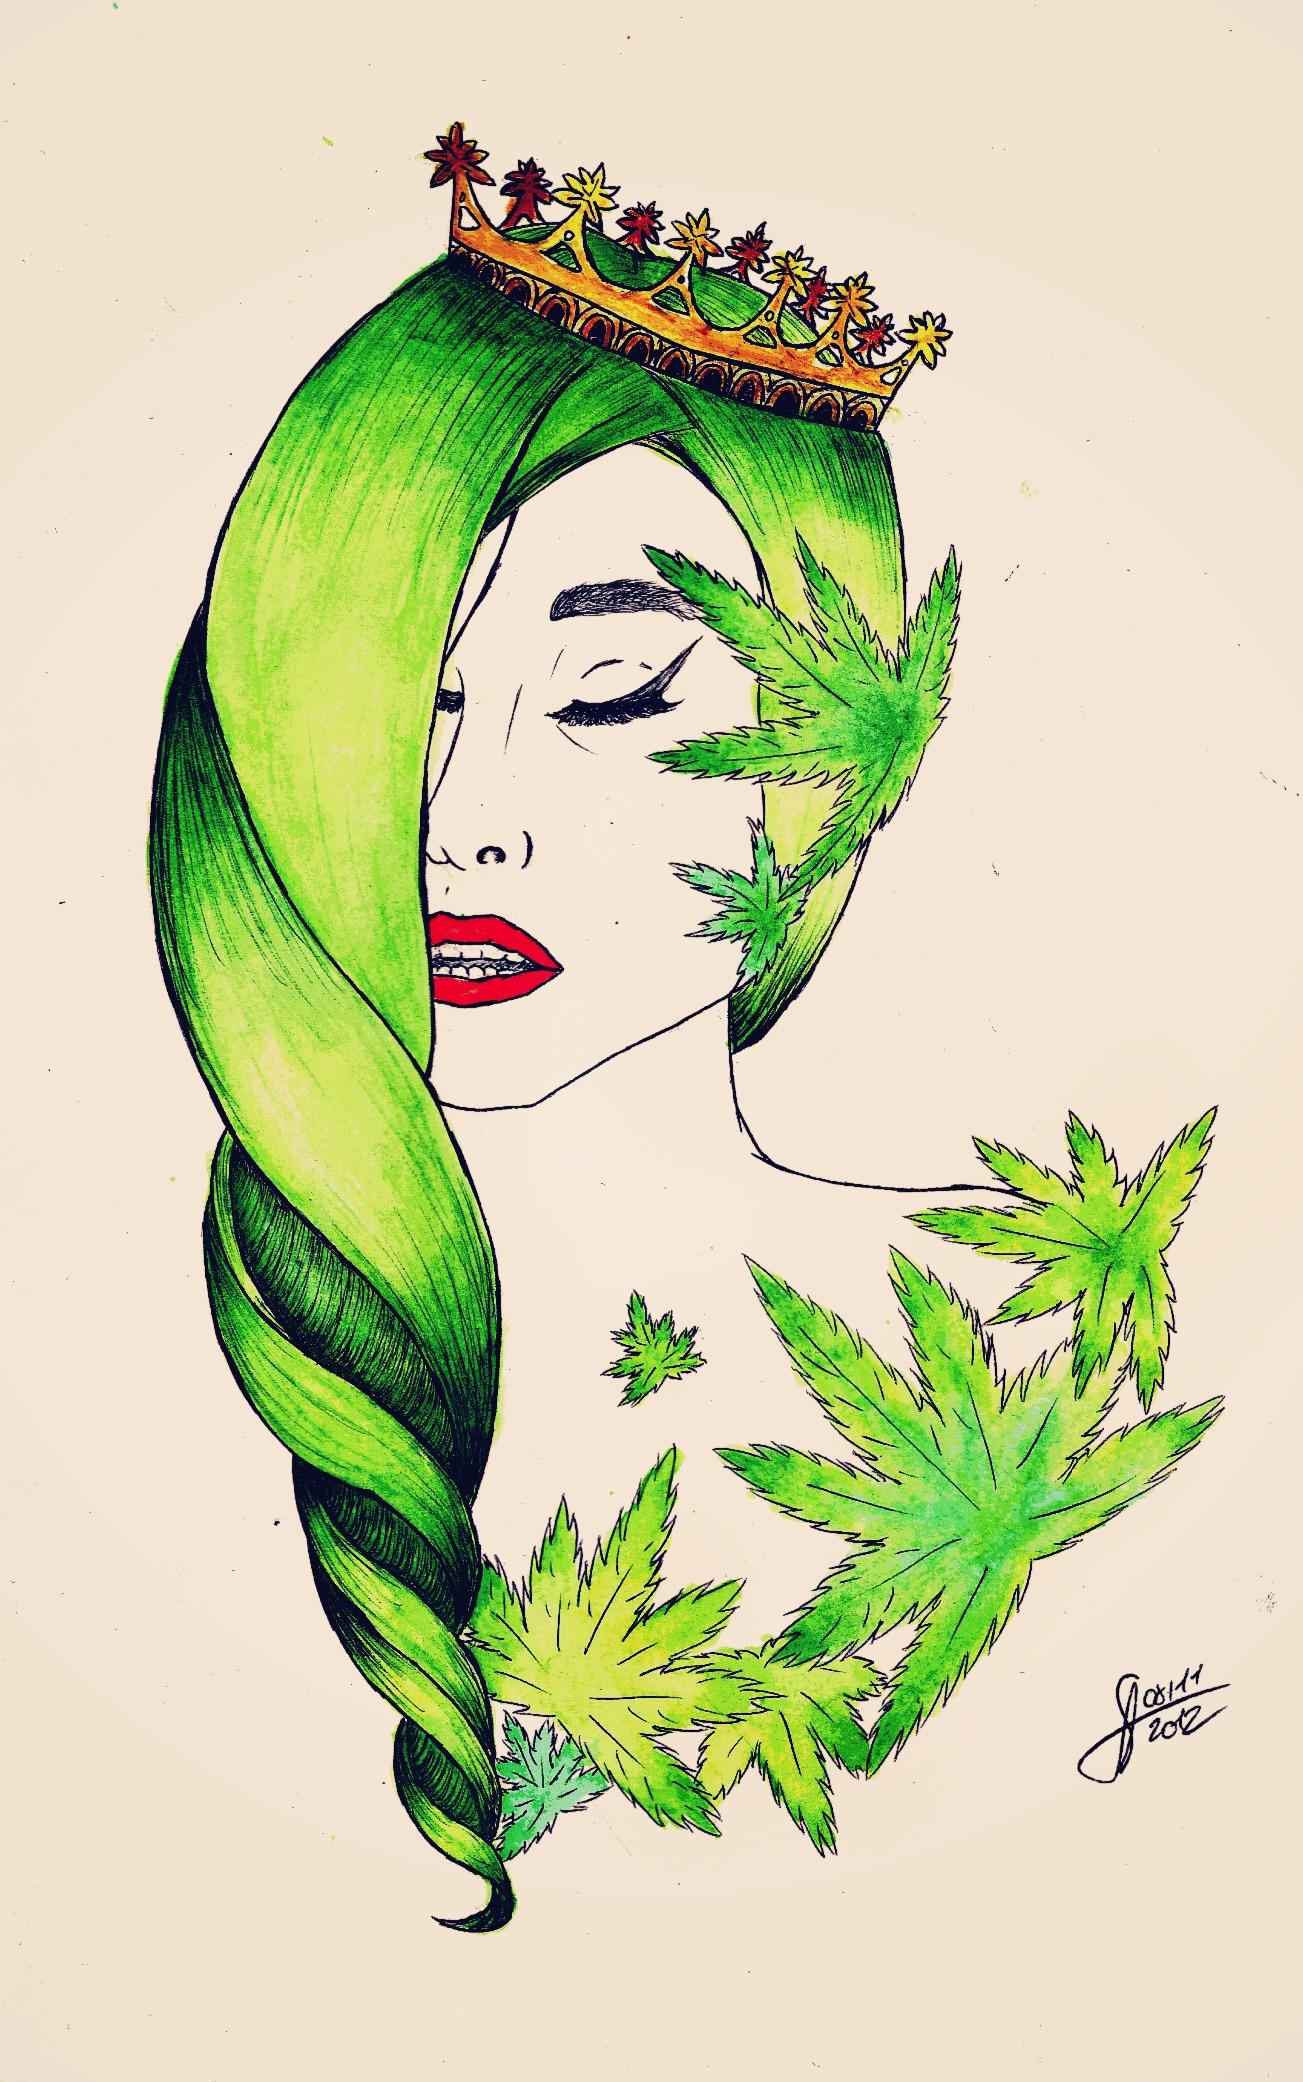 Gaga cannabis princess by Ritorumonsuta - 653.8KB